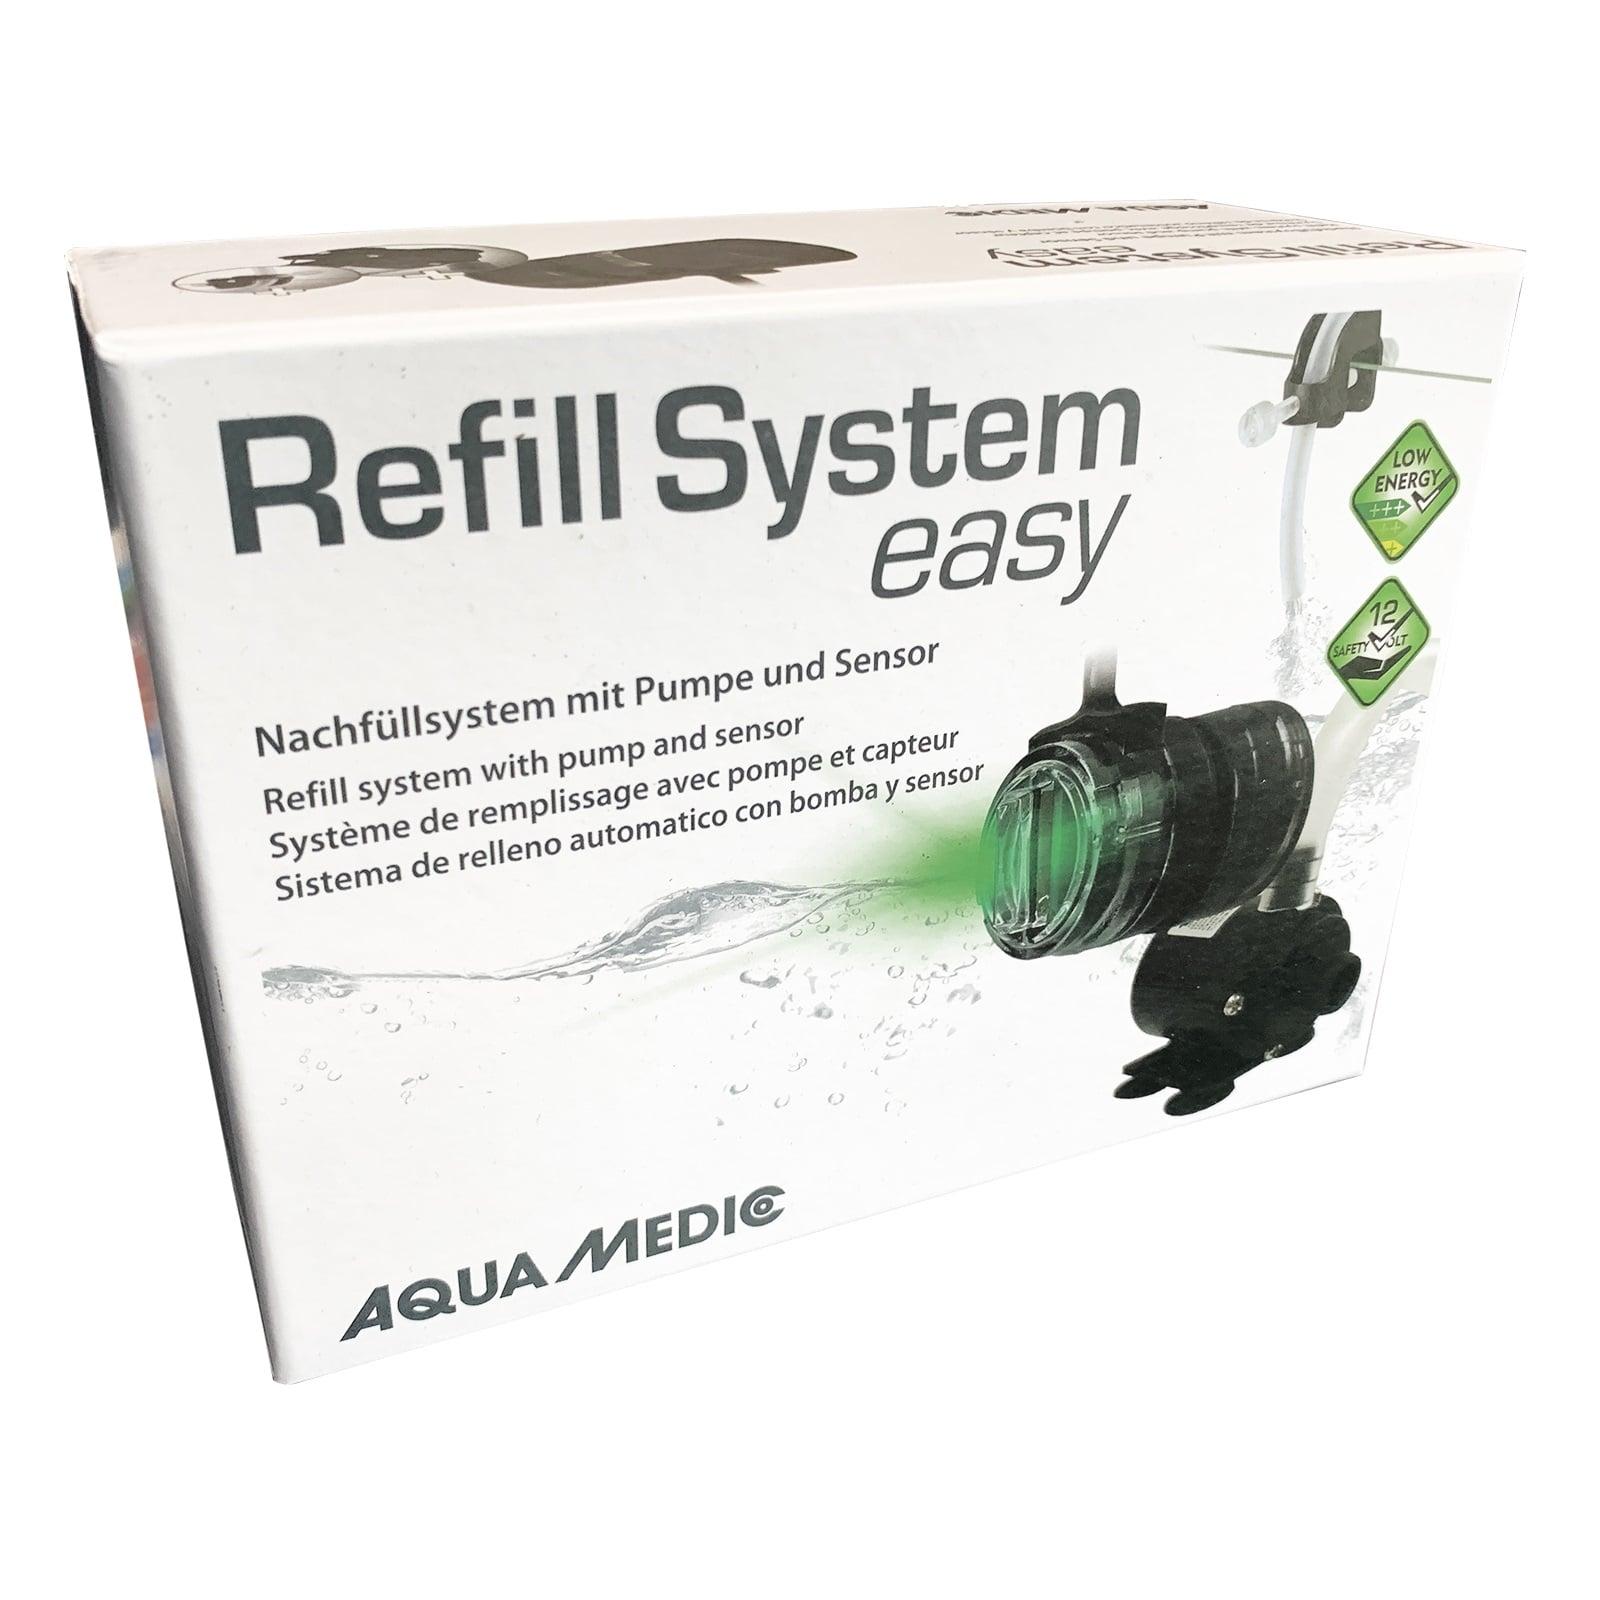 AQUA MEDIC Refill System Easy osmolateur avec pompe et capteur infrarouge